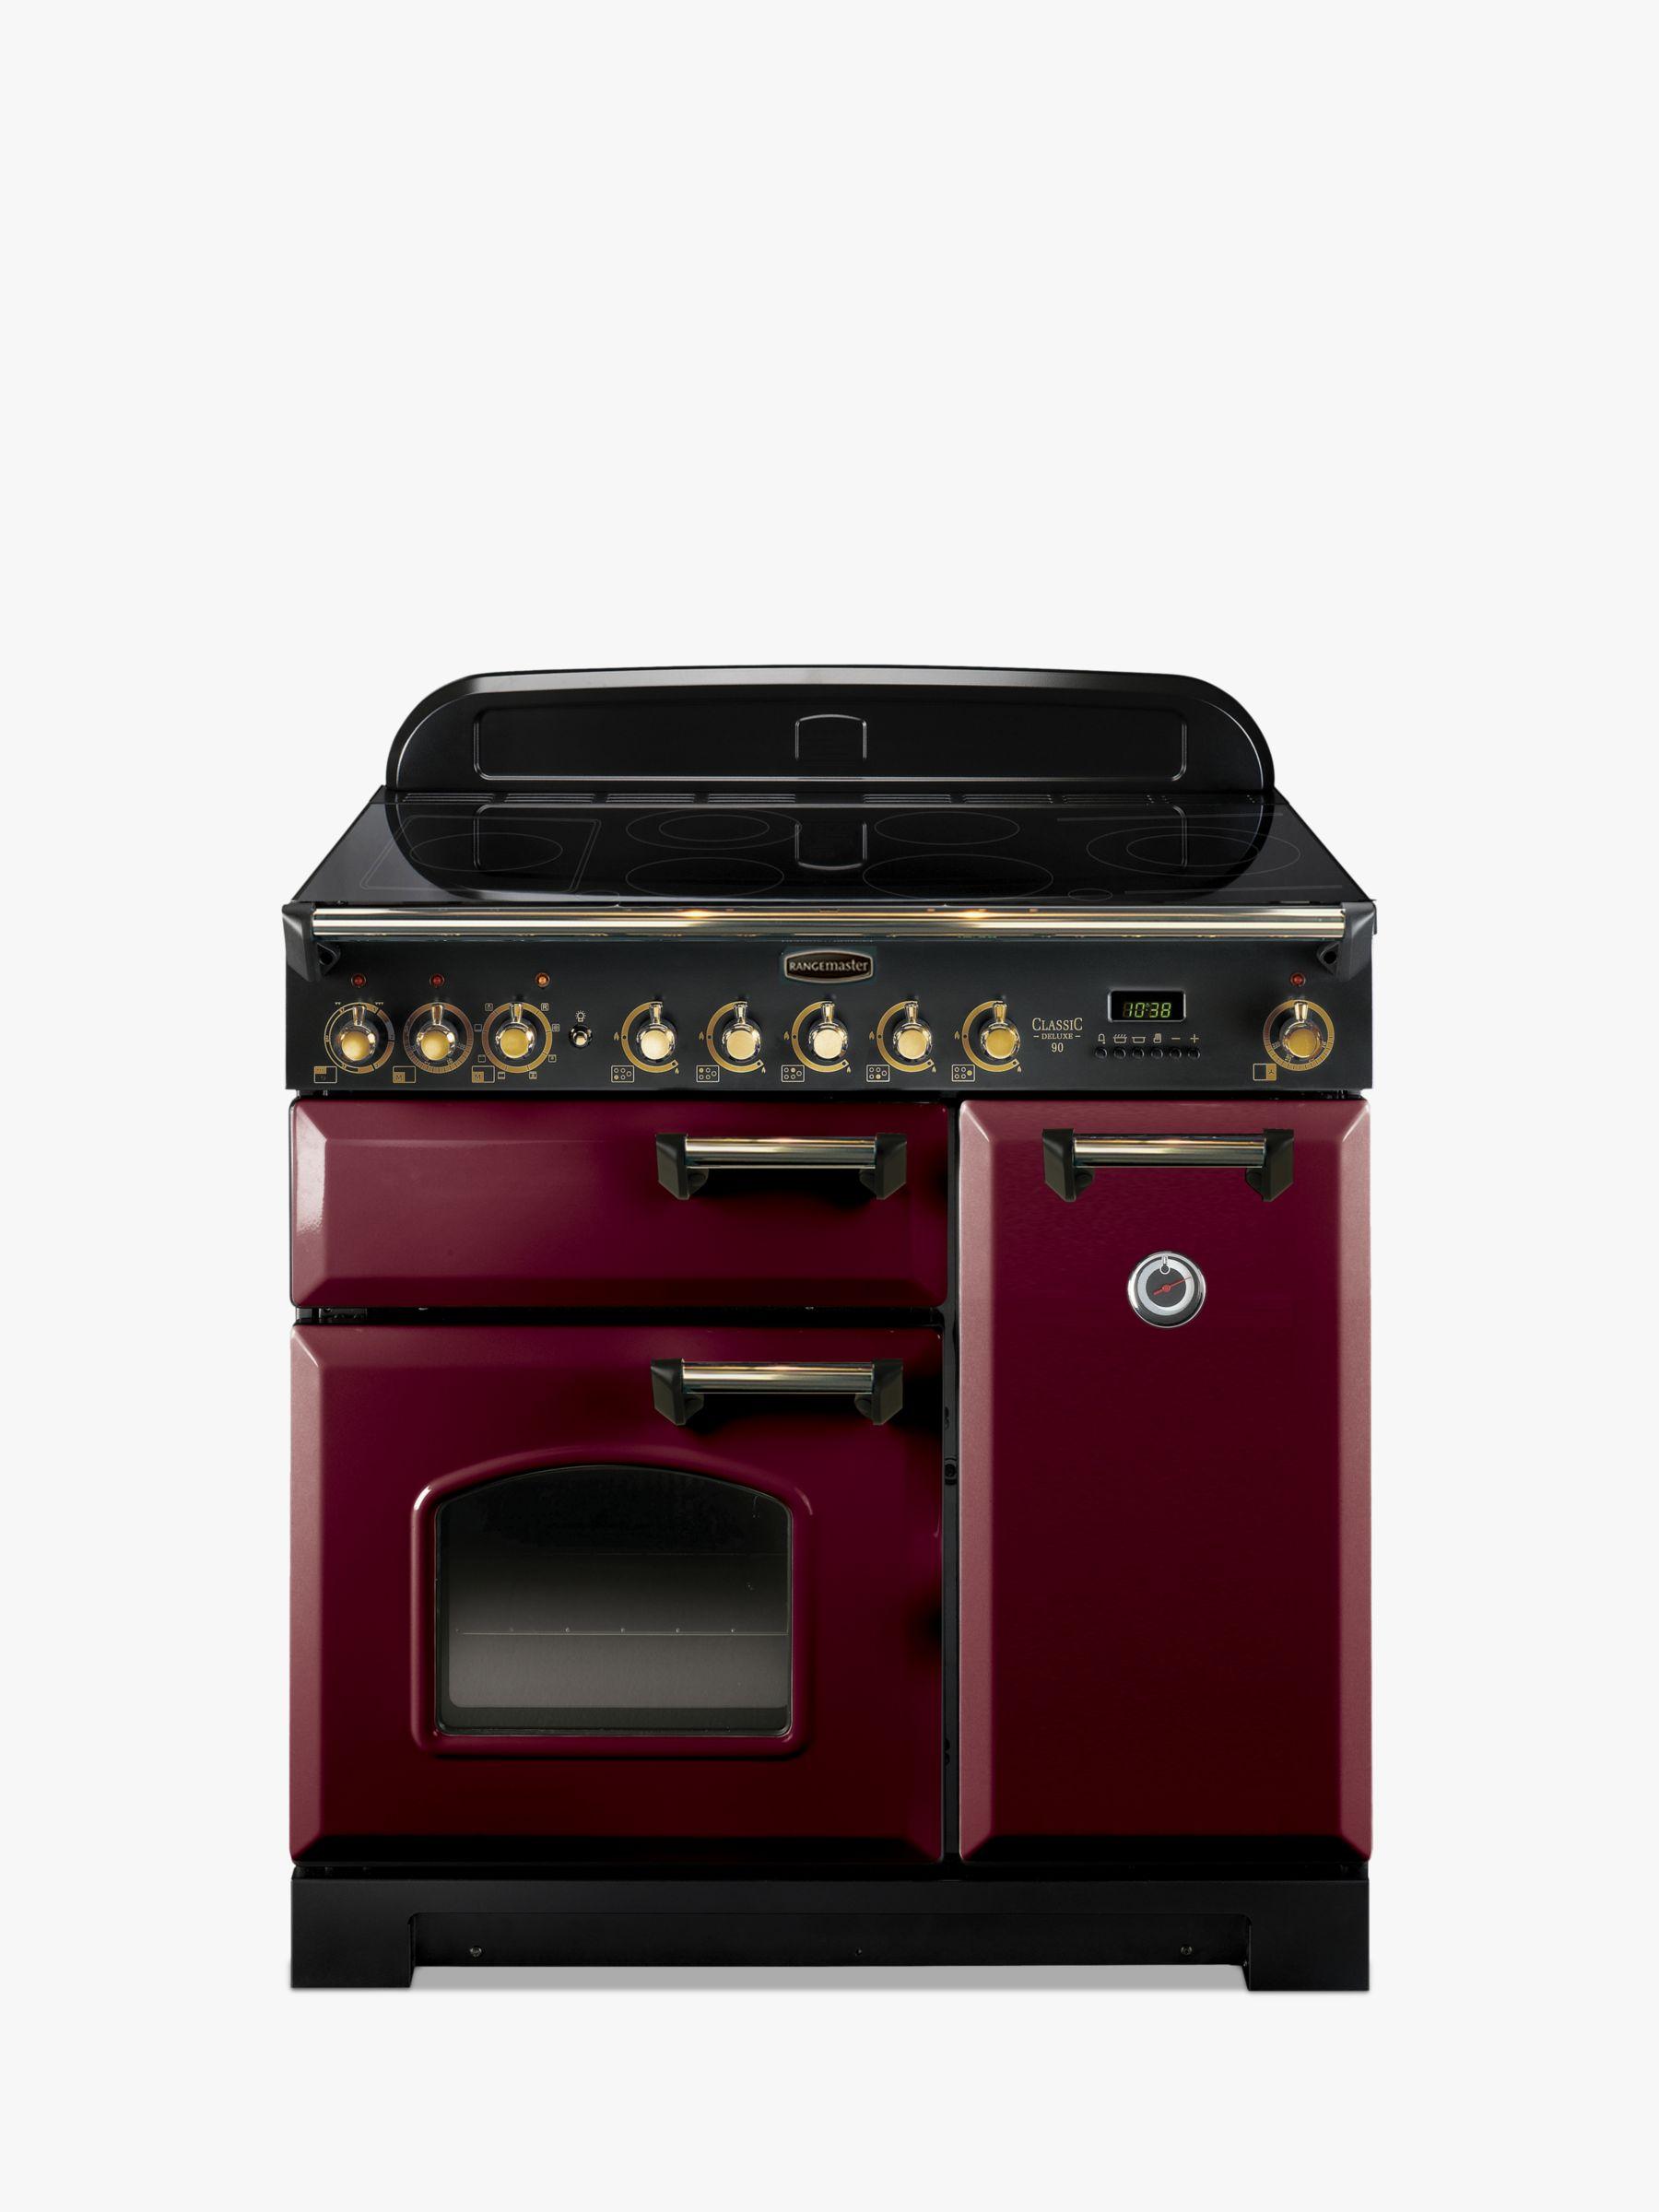 Rangemaster Rangemaster Classic Deluxe 90 Electric Range Cooker, Cranberry/Brass Trim